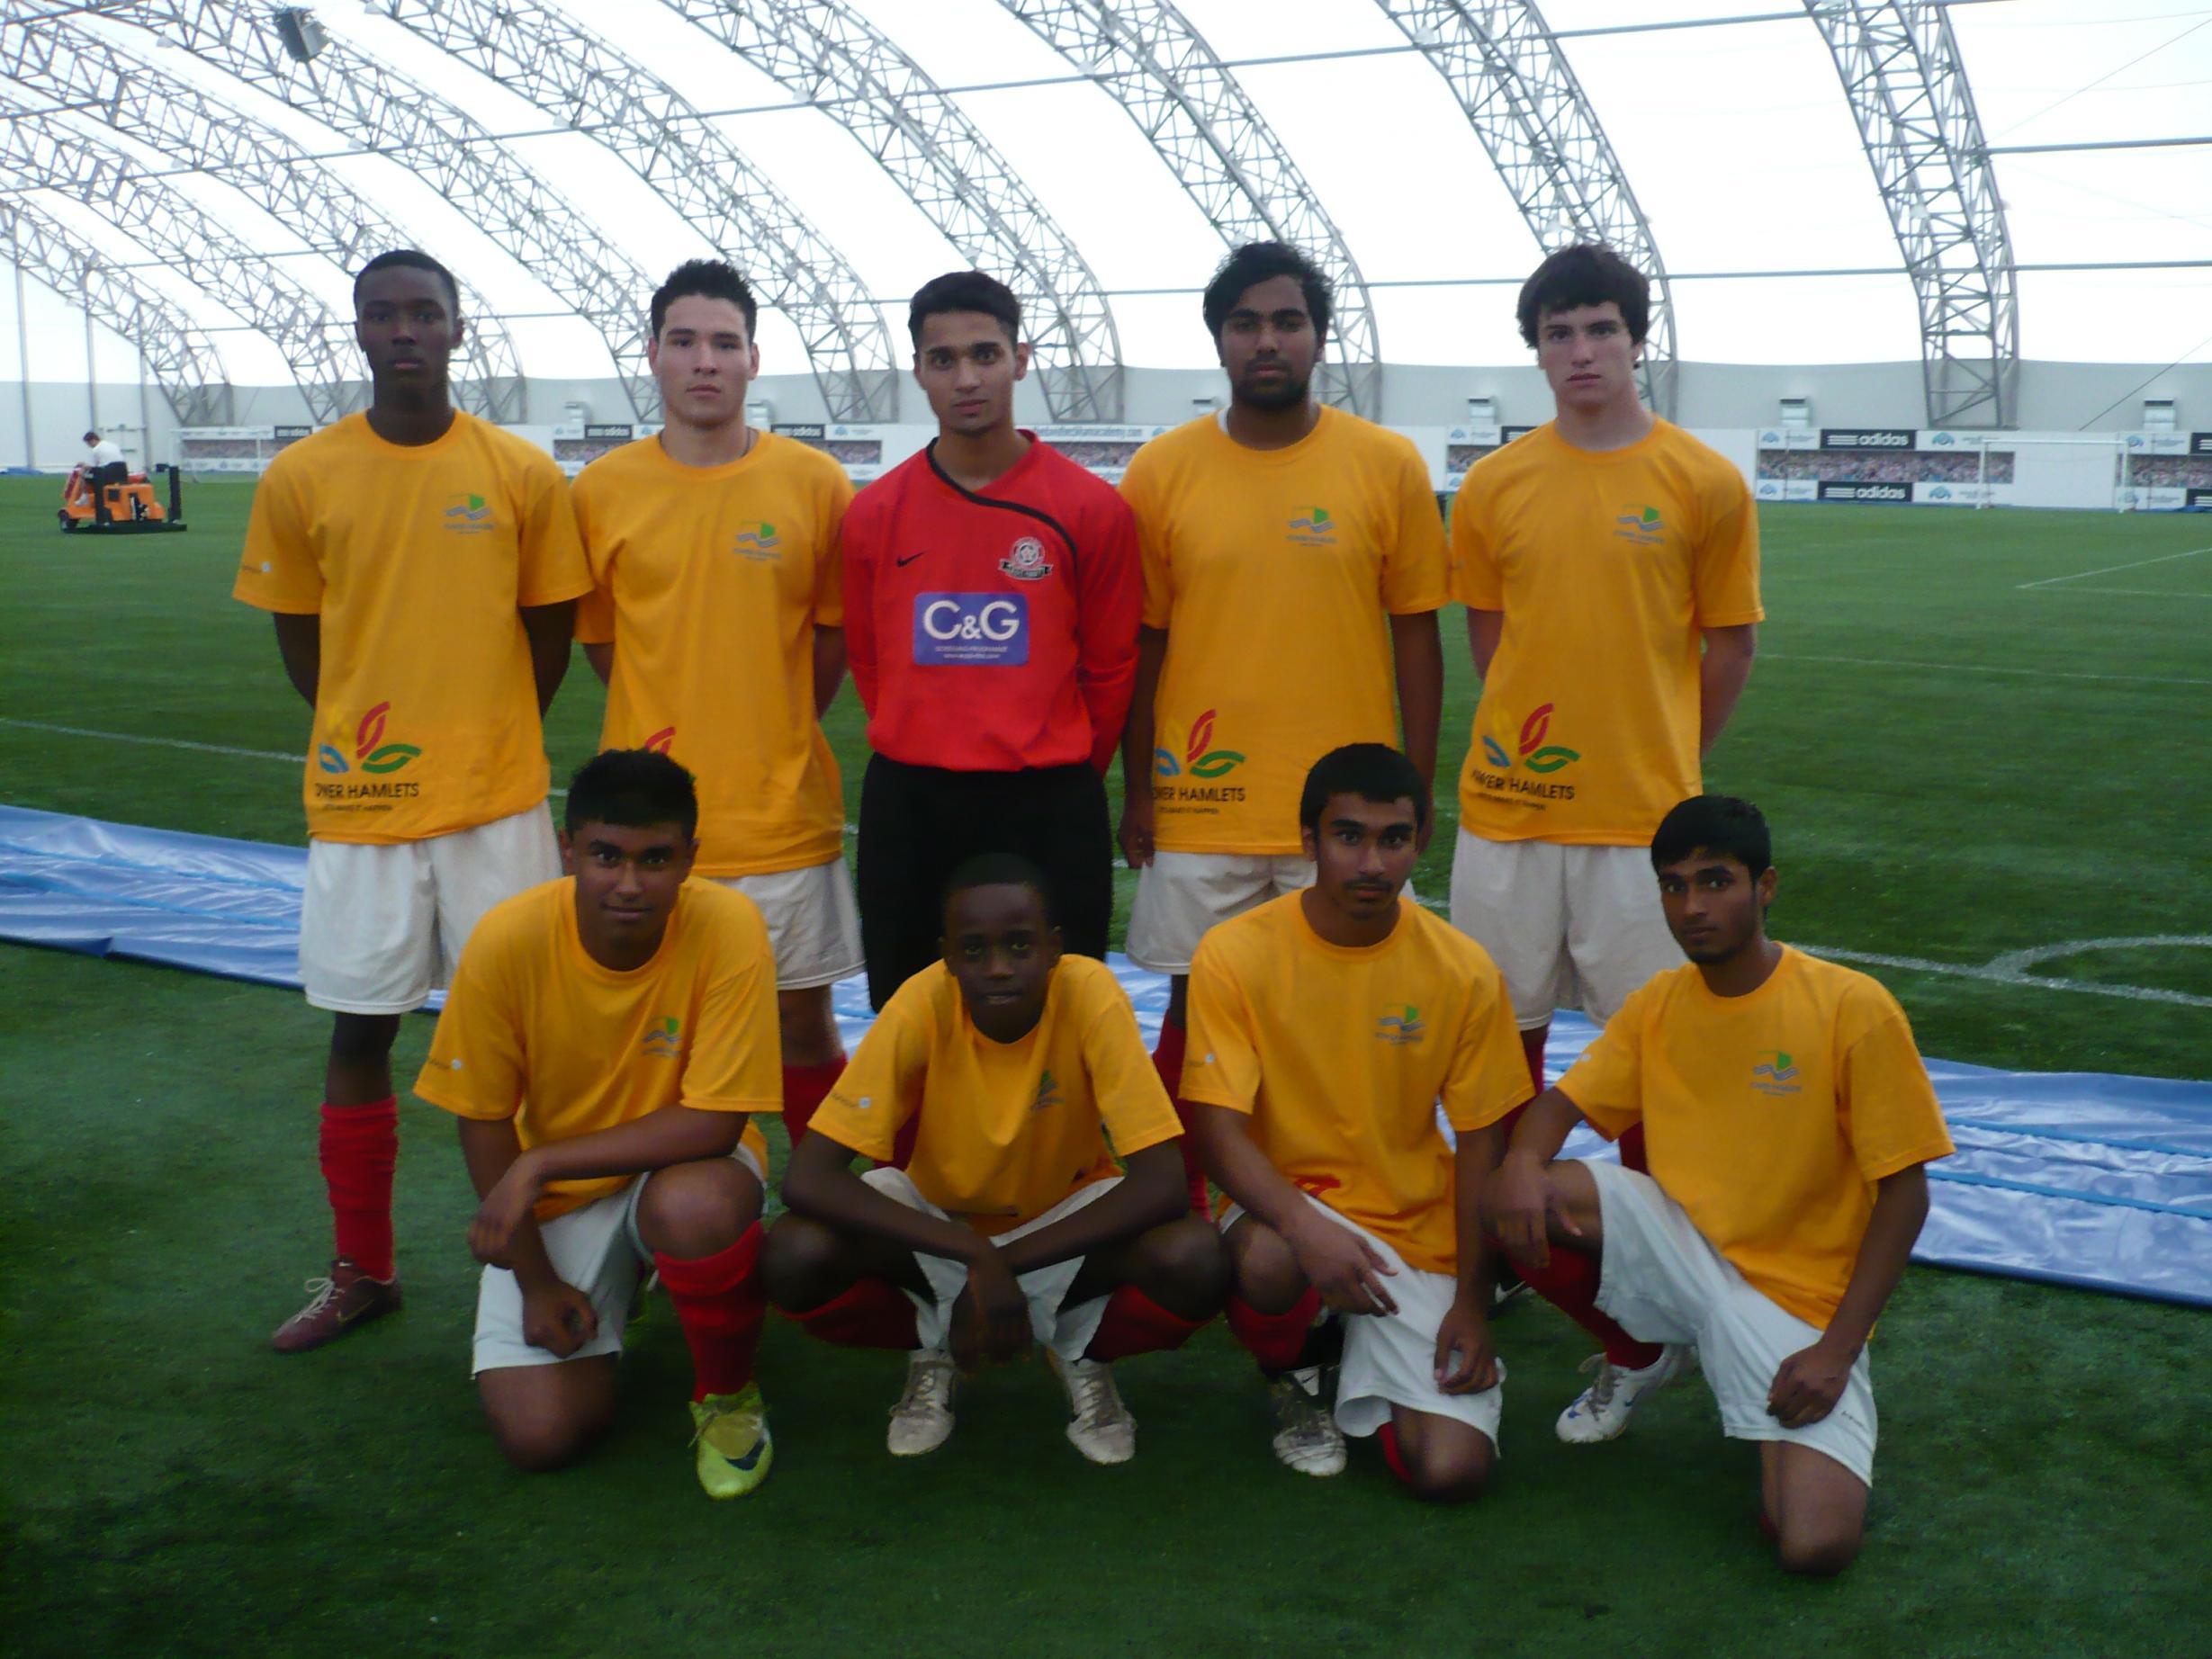 Tower_Hamlets_U18-2009.JPG